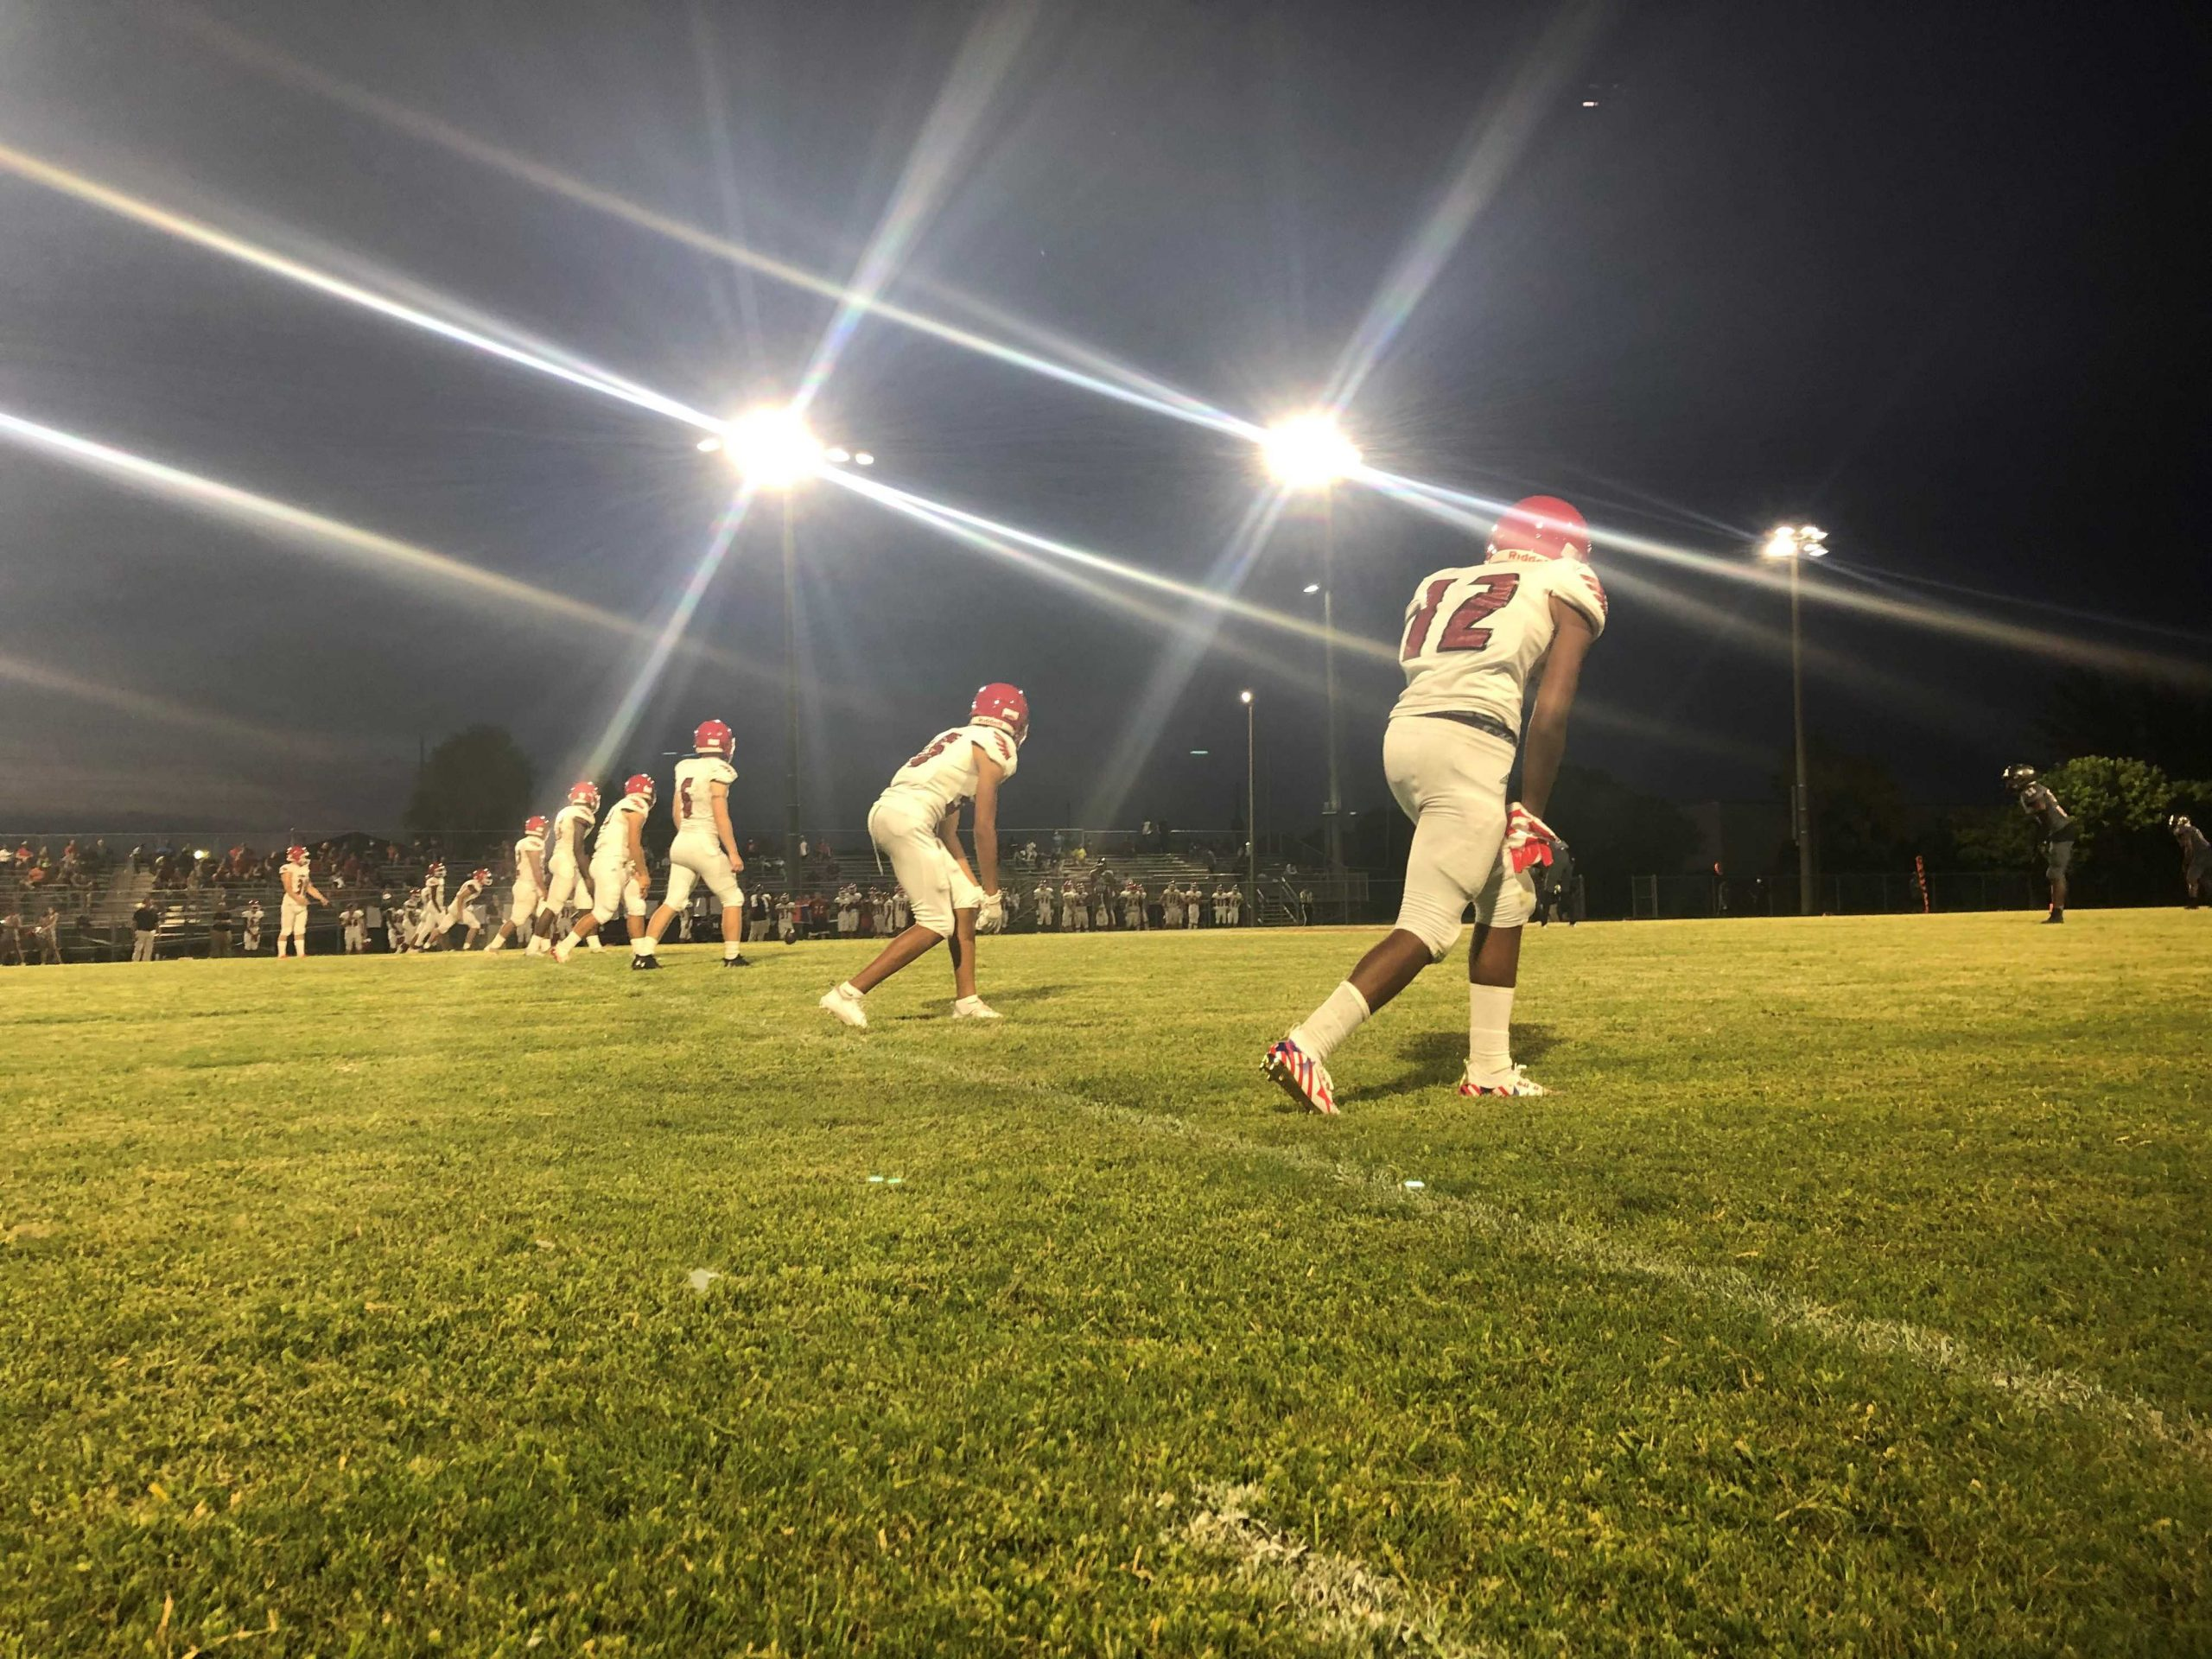 PHOTOS: Week 0 of High School Football in Palm Beach County and the Treasure Coast